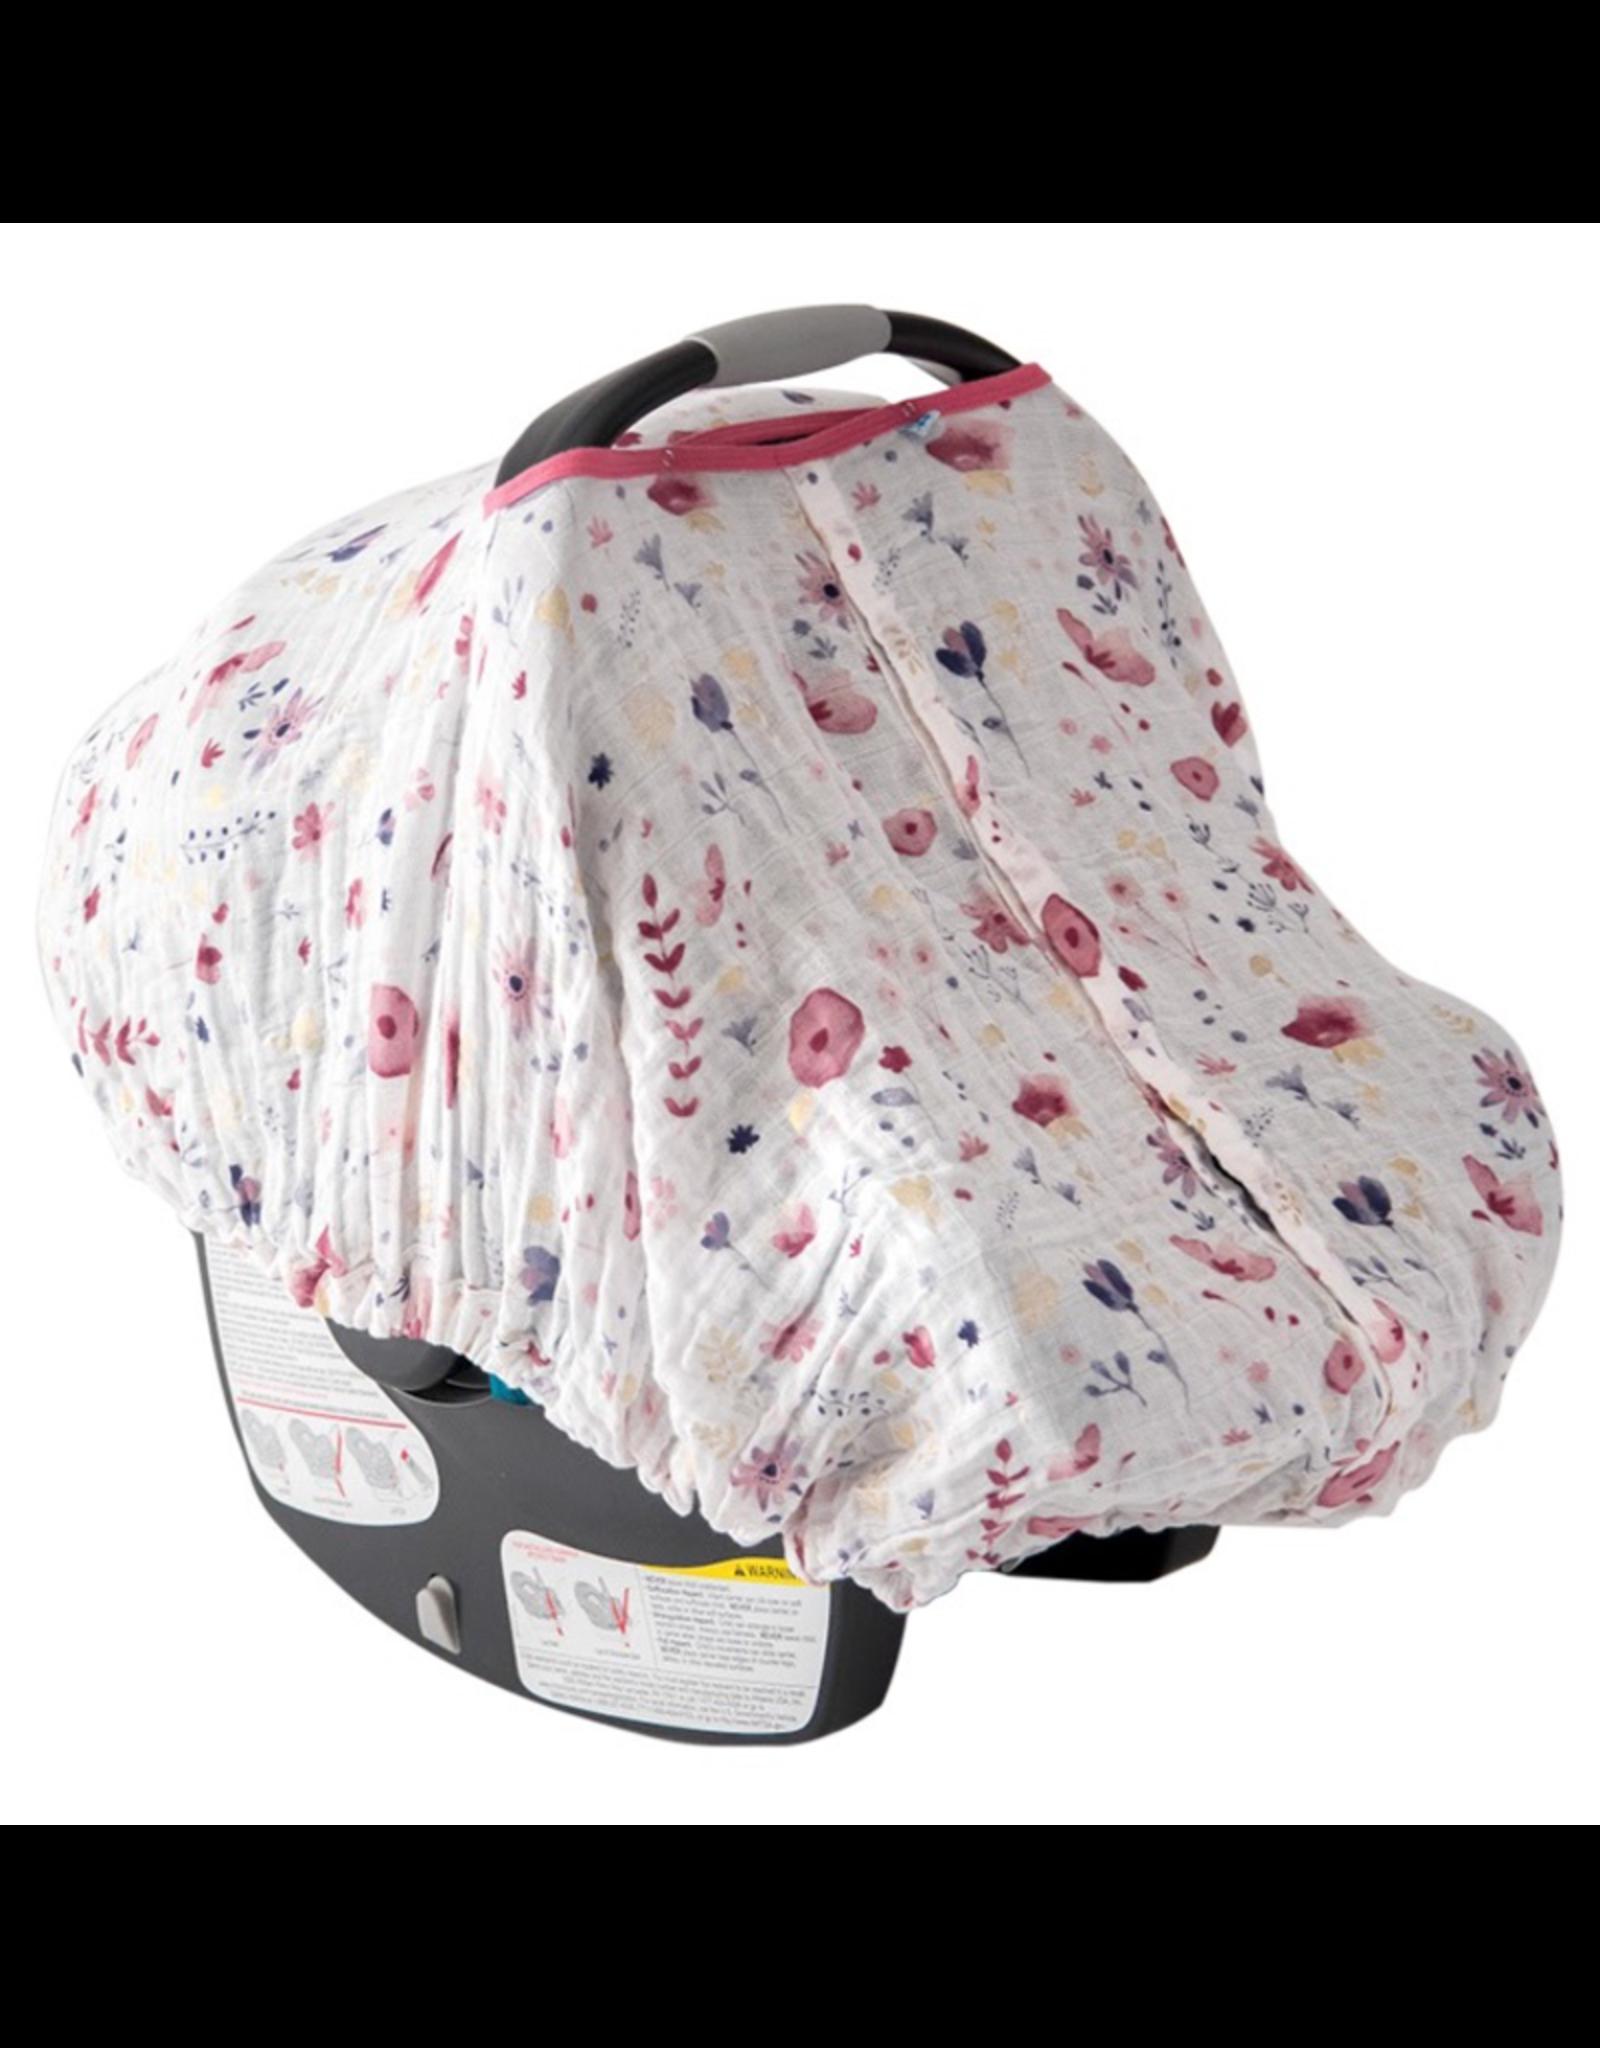 Little Unicorn Little Unicorn Cotton Muslin Car Seat Canopy- Fairy Garden